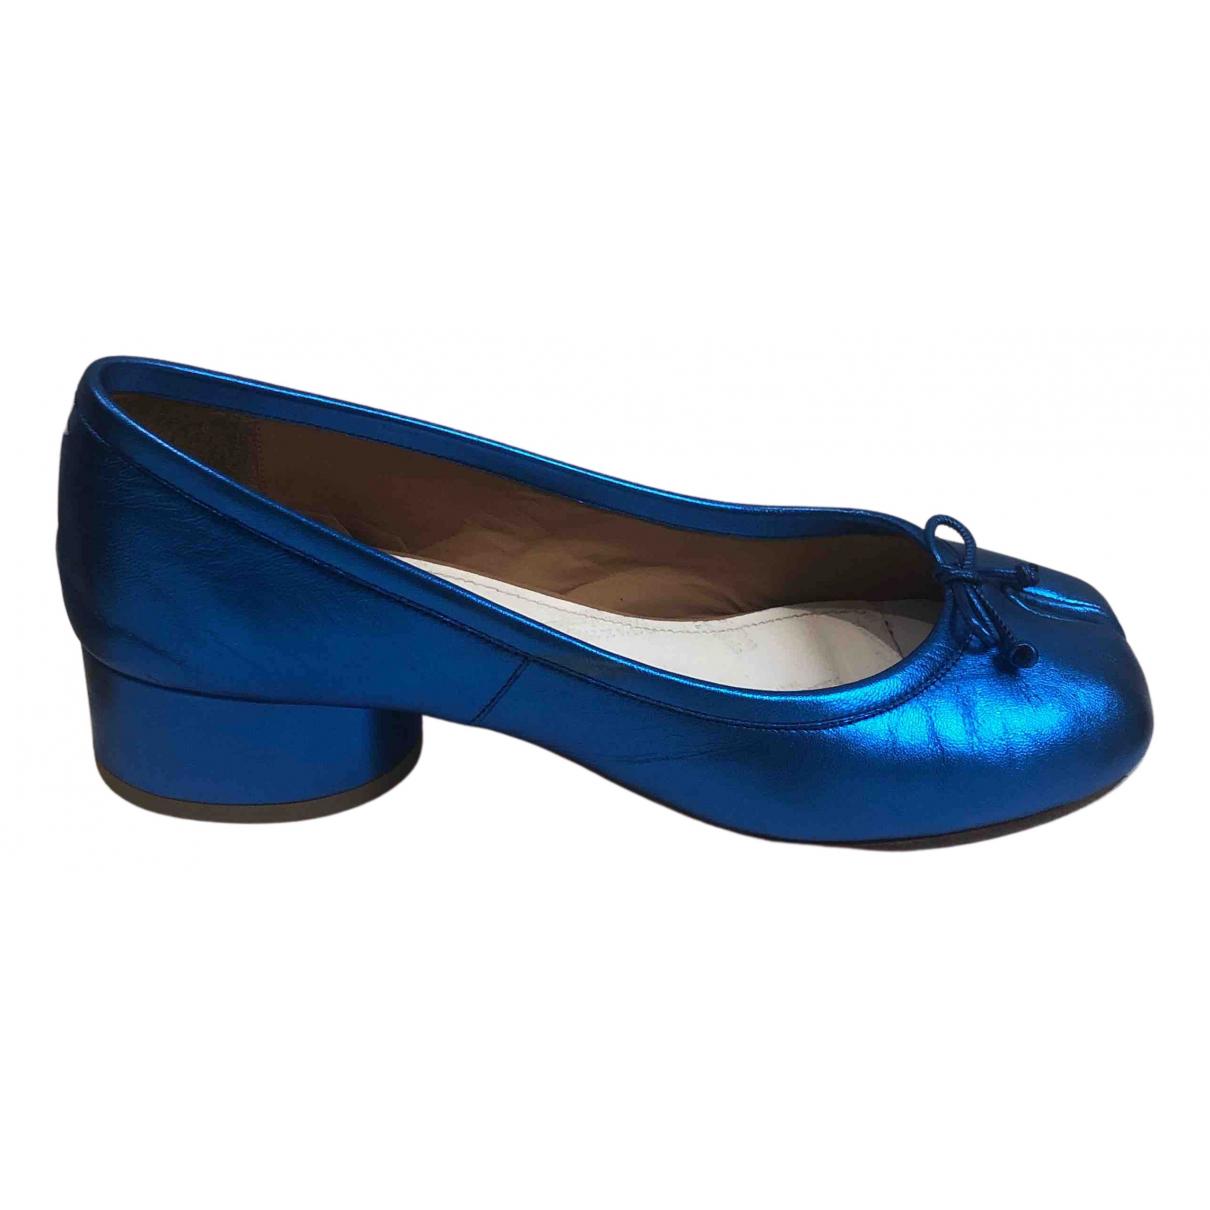 Maison Martin Margiela N Blue Leather Ballet flats for Women 38 EU